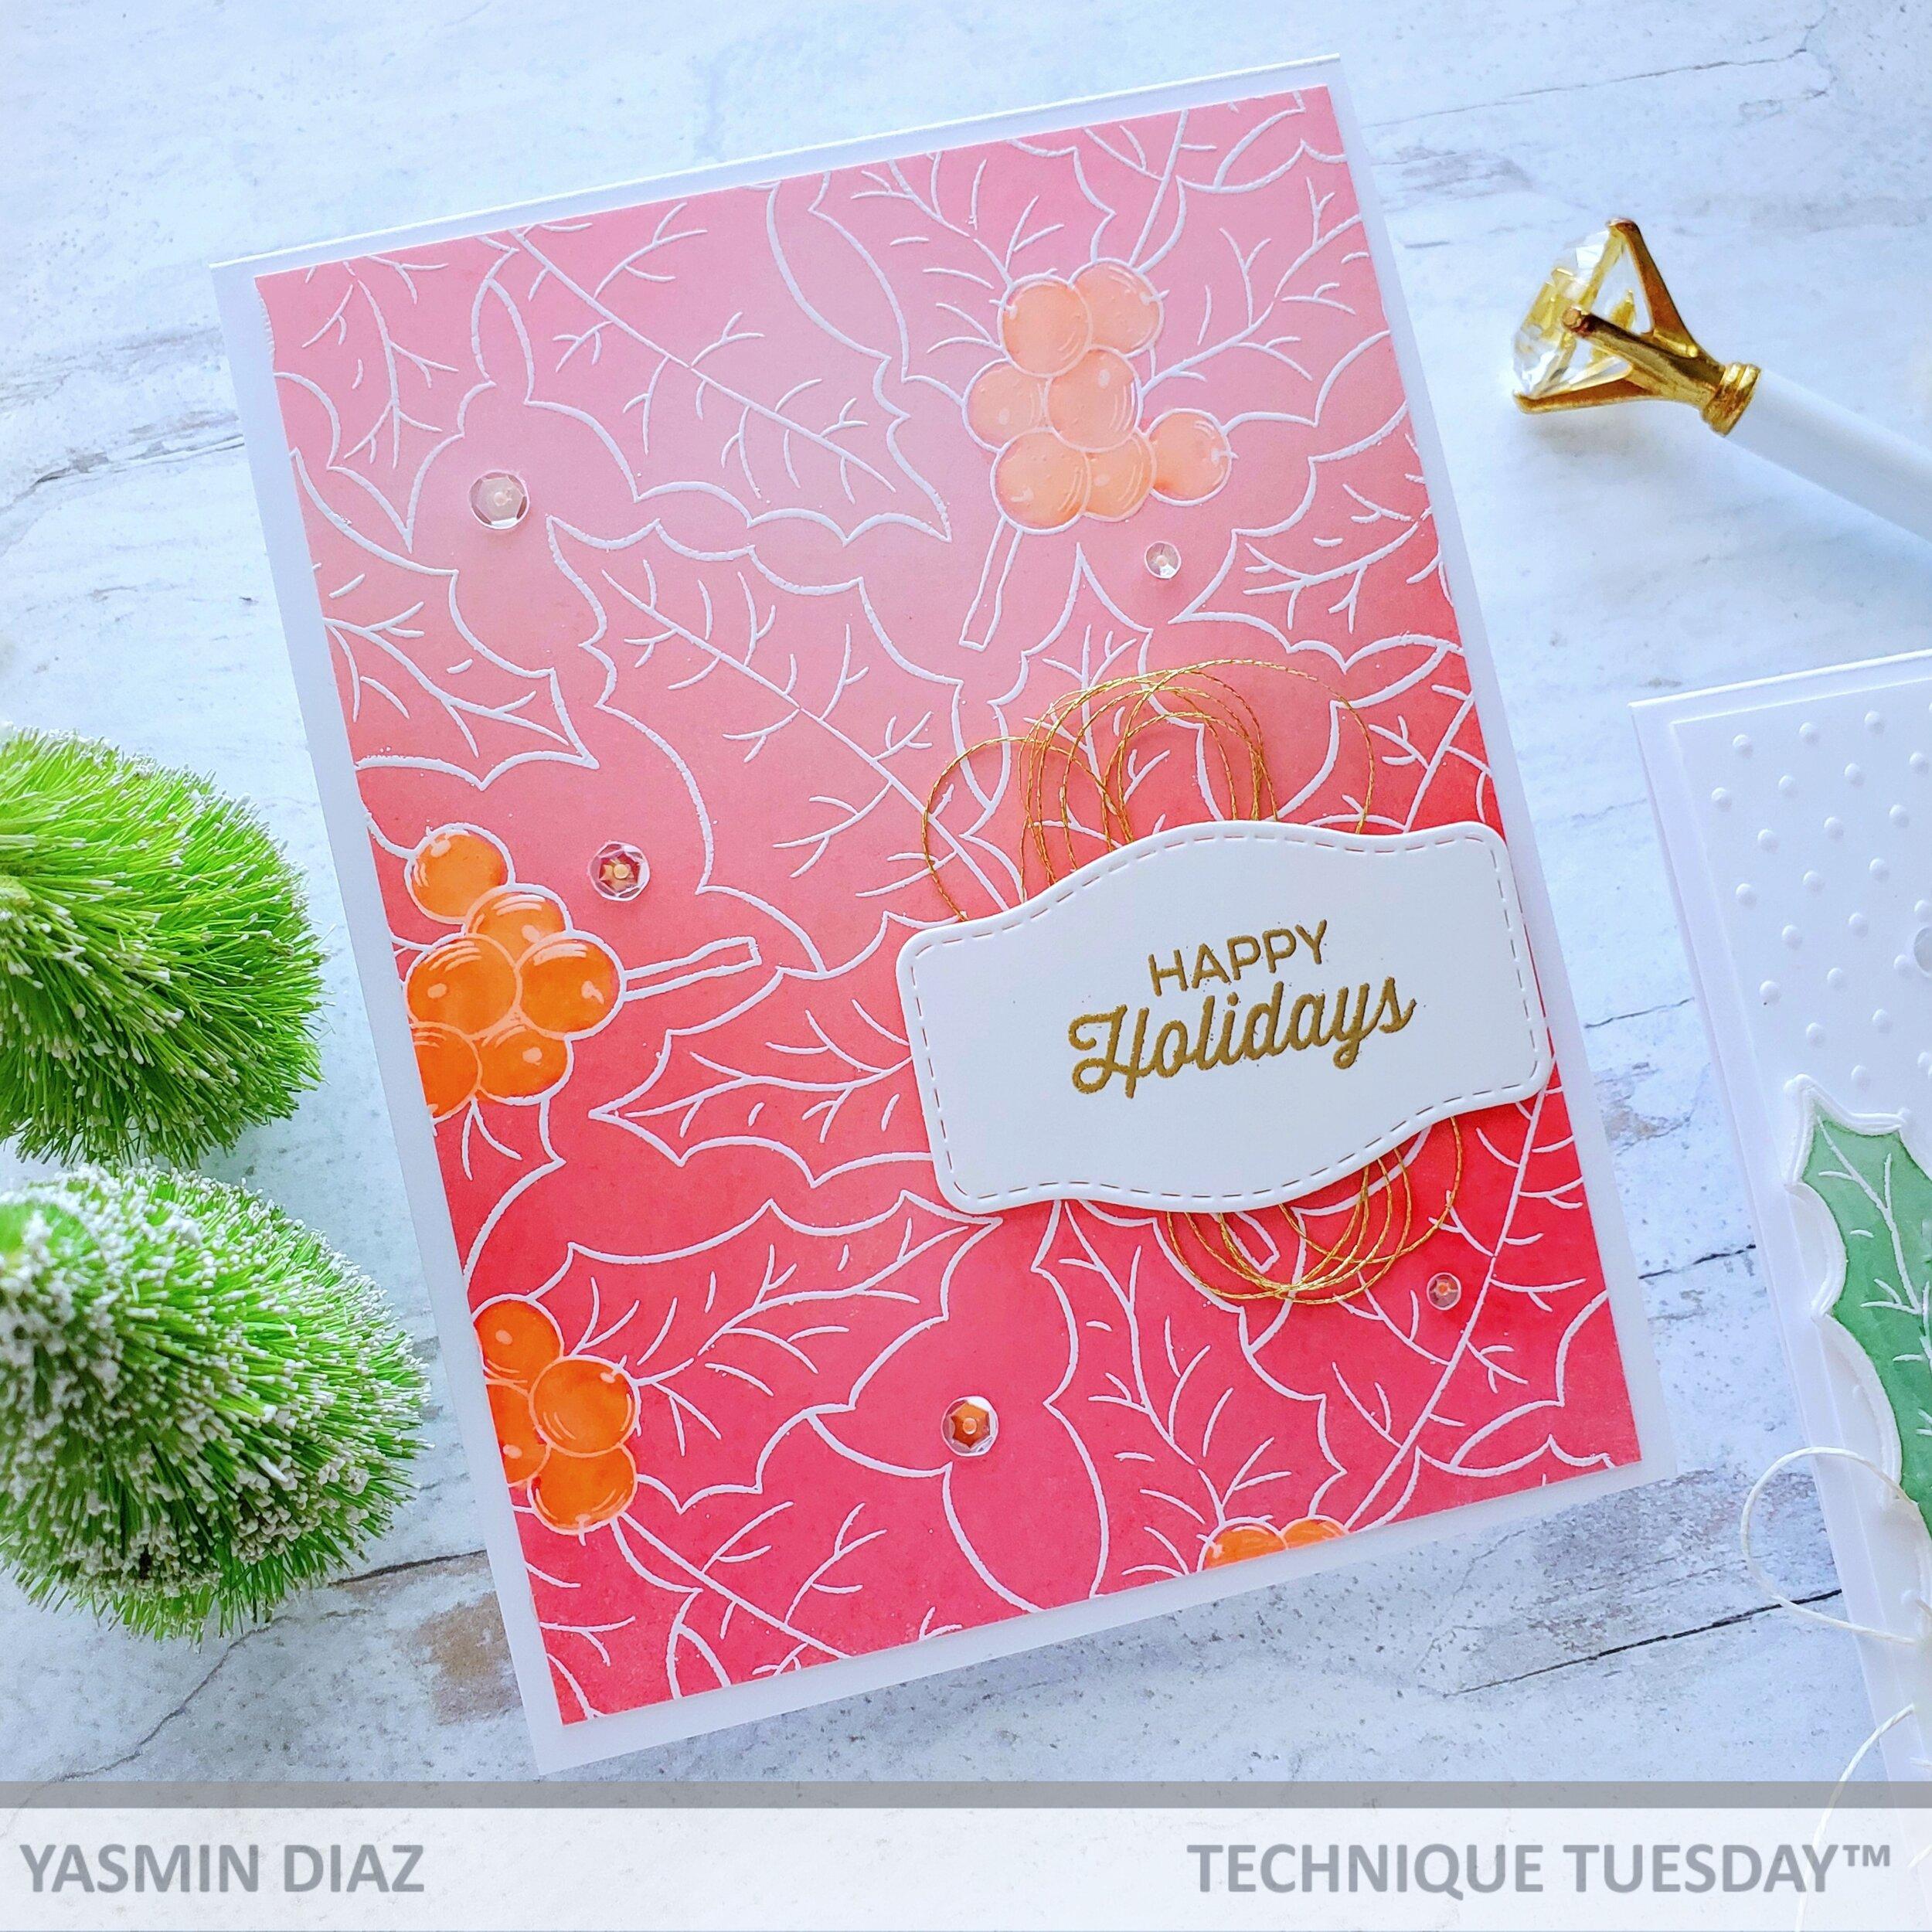 October-Yasmin-Diaz-Holly-Stamp-Cards-2.jpg